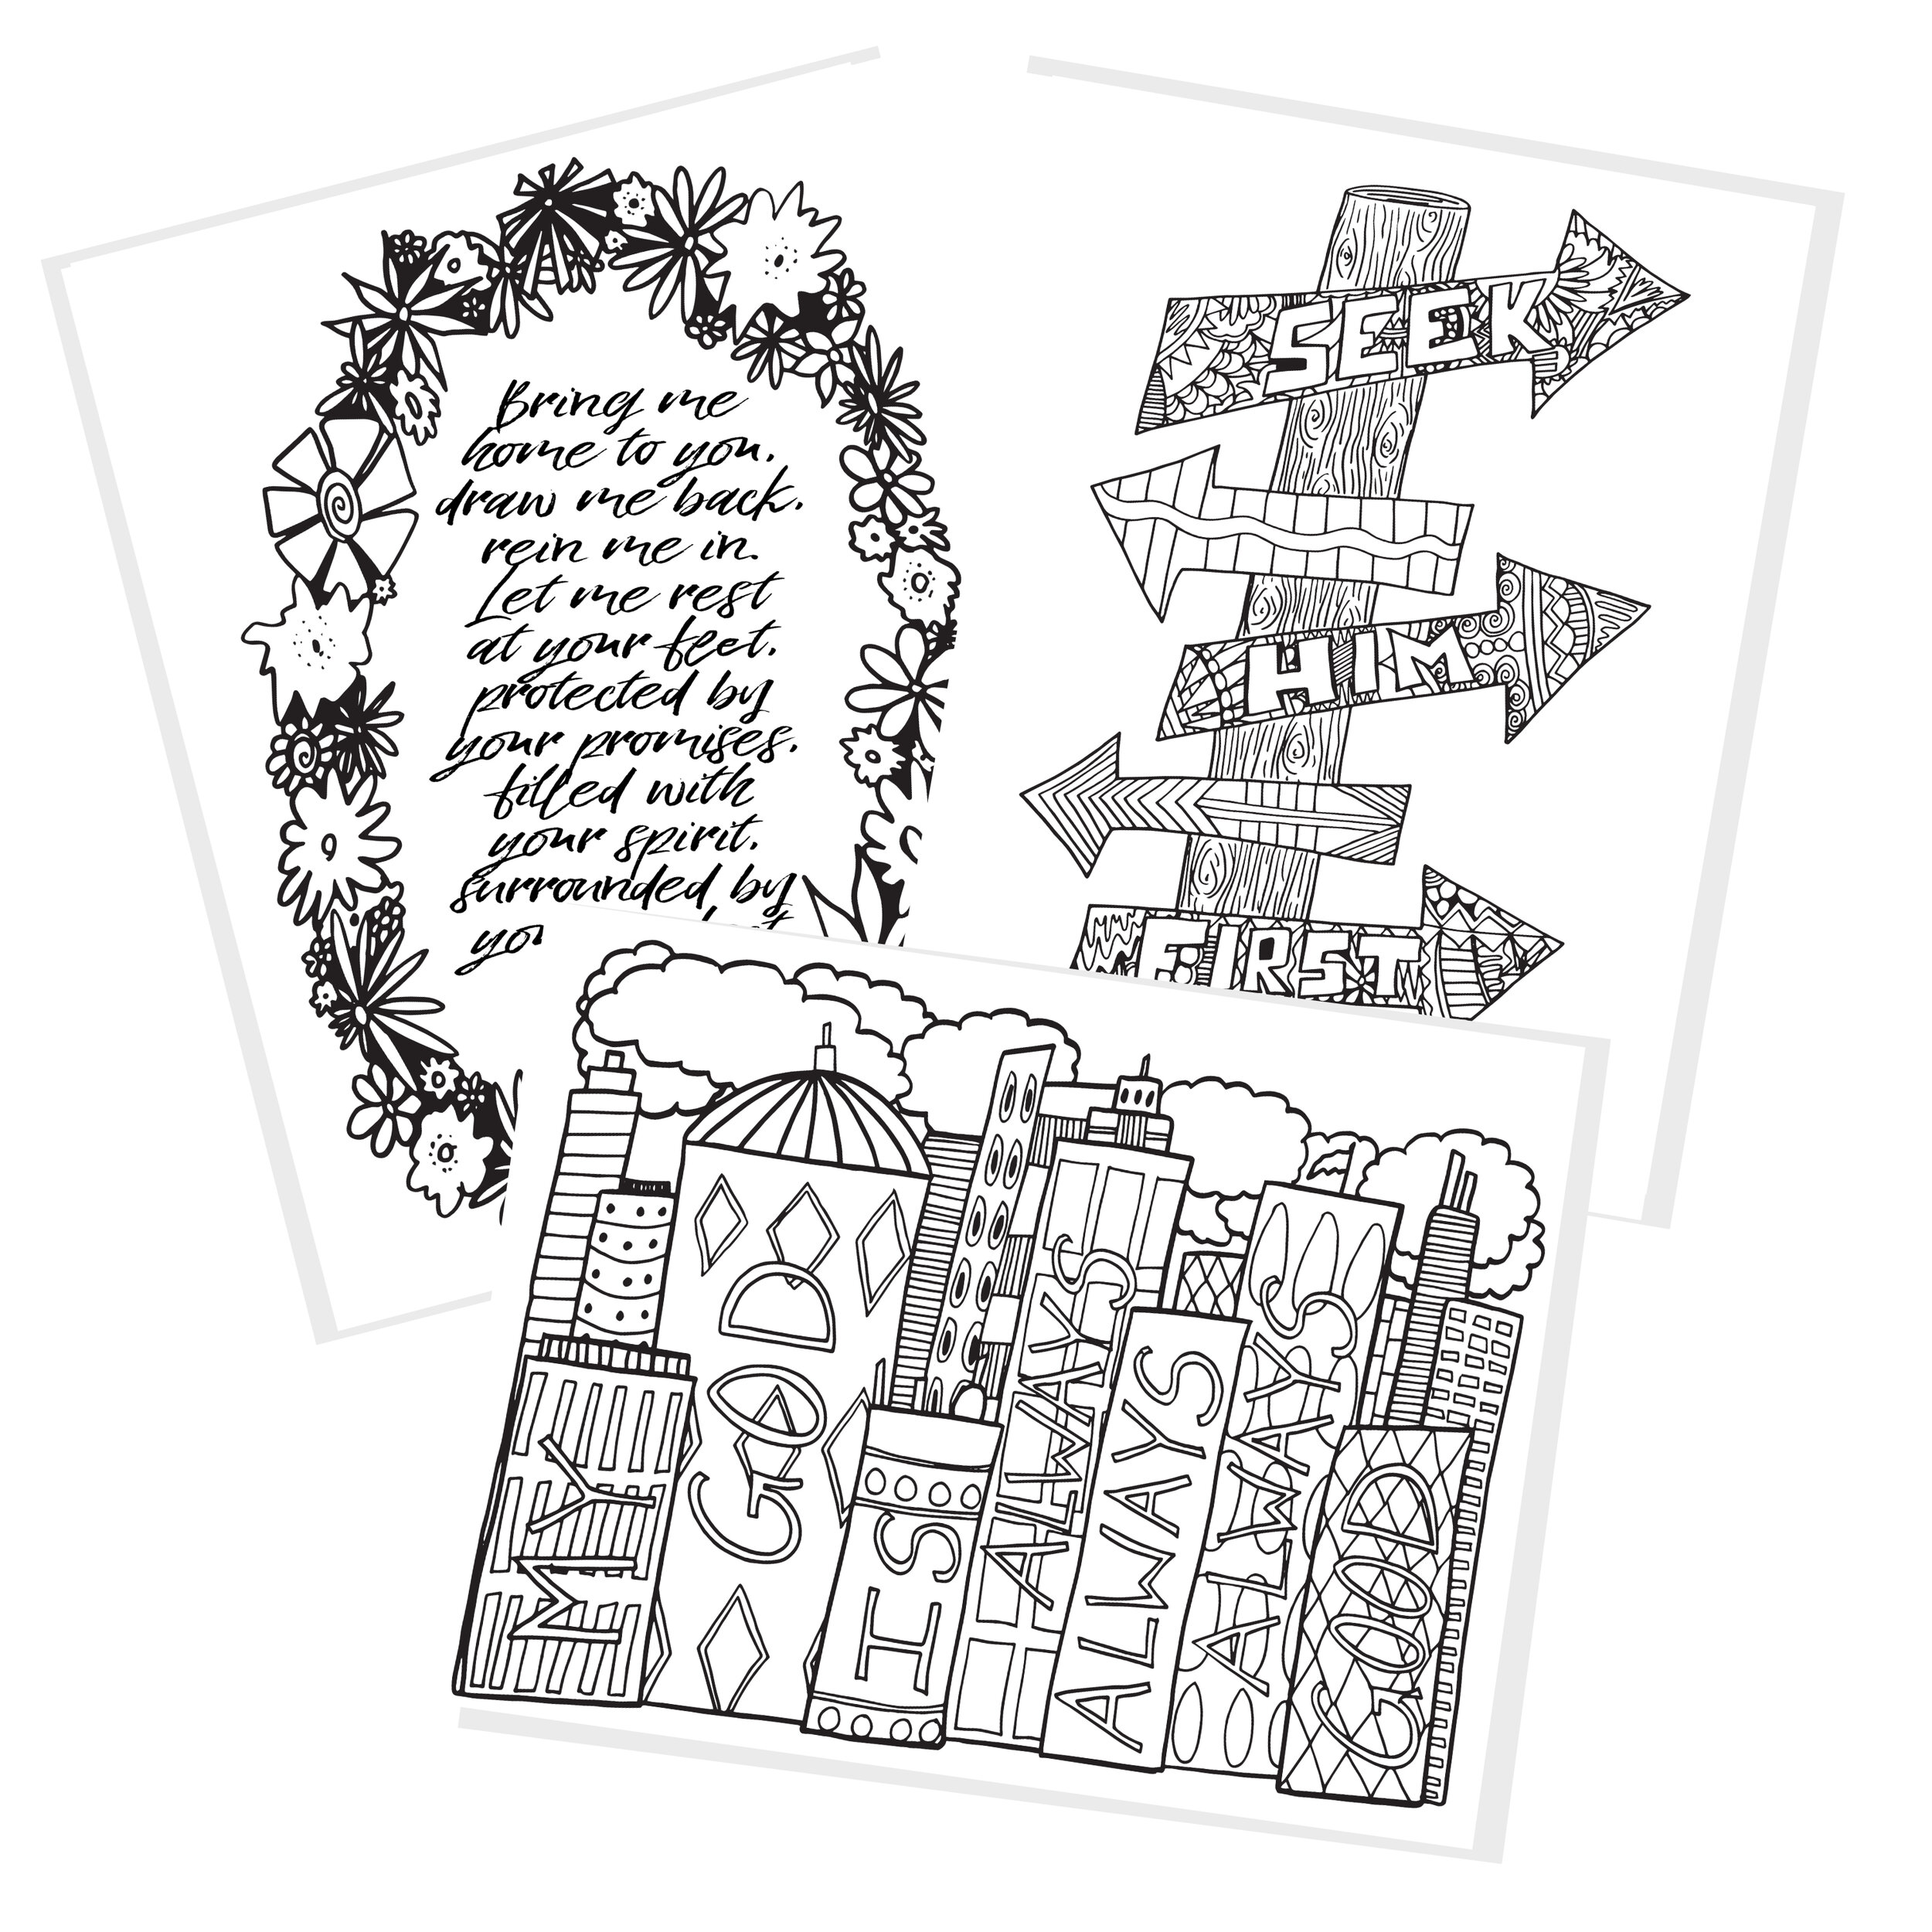 Capturing Thoughts Coloring Book Mockup 3.jpg